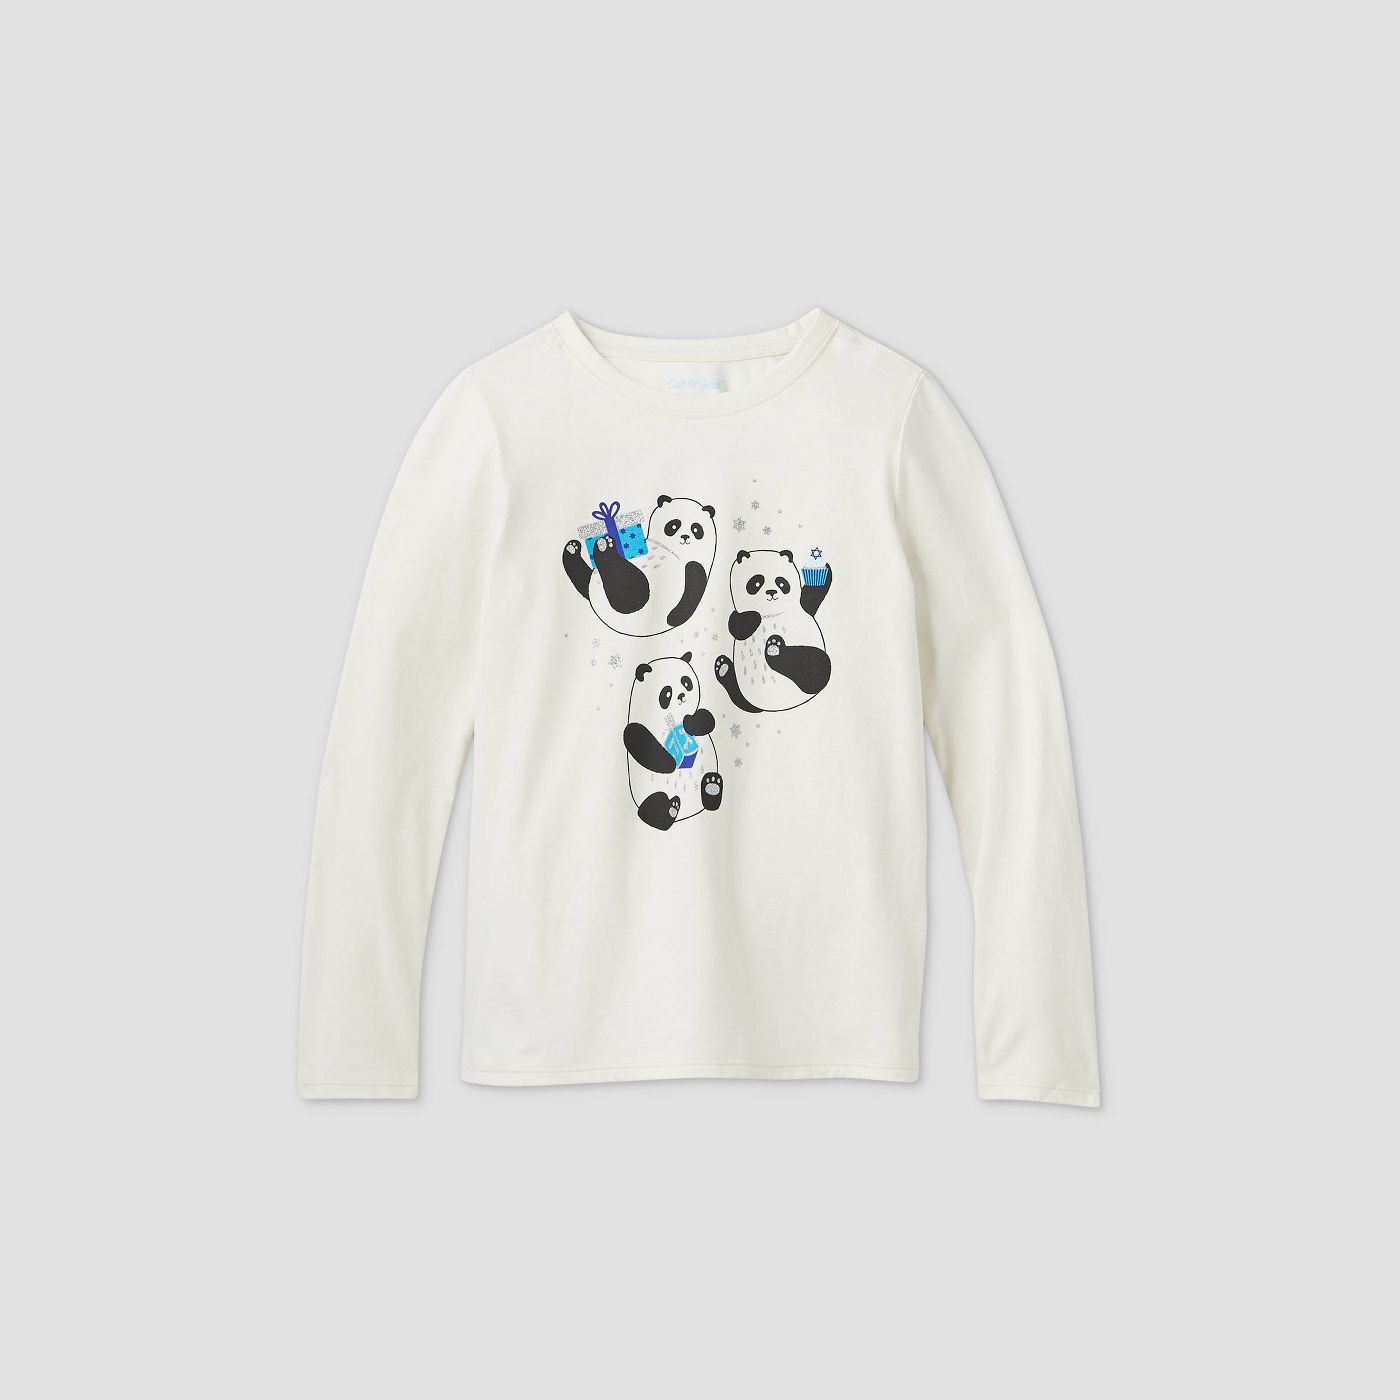 Target Hanukkah shirt panda